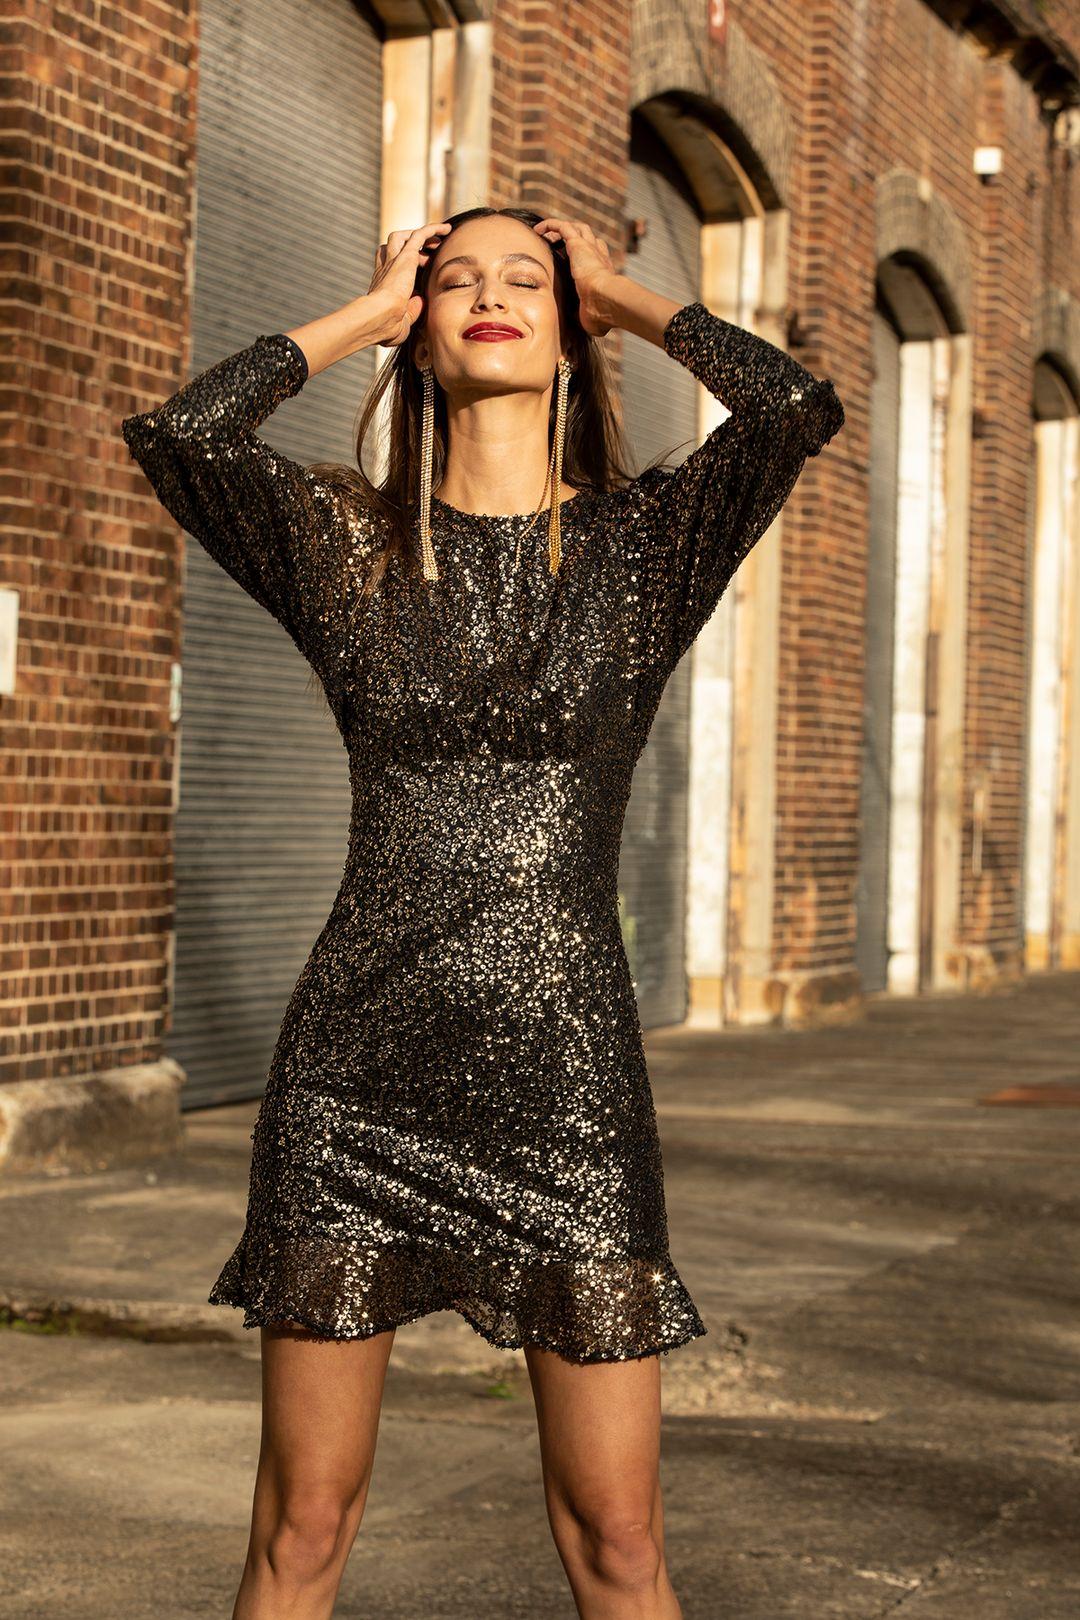 misha-brielle-mini-dress-metallic-campaign